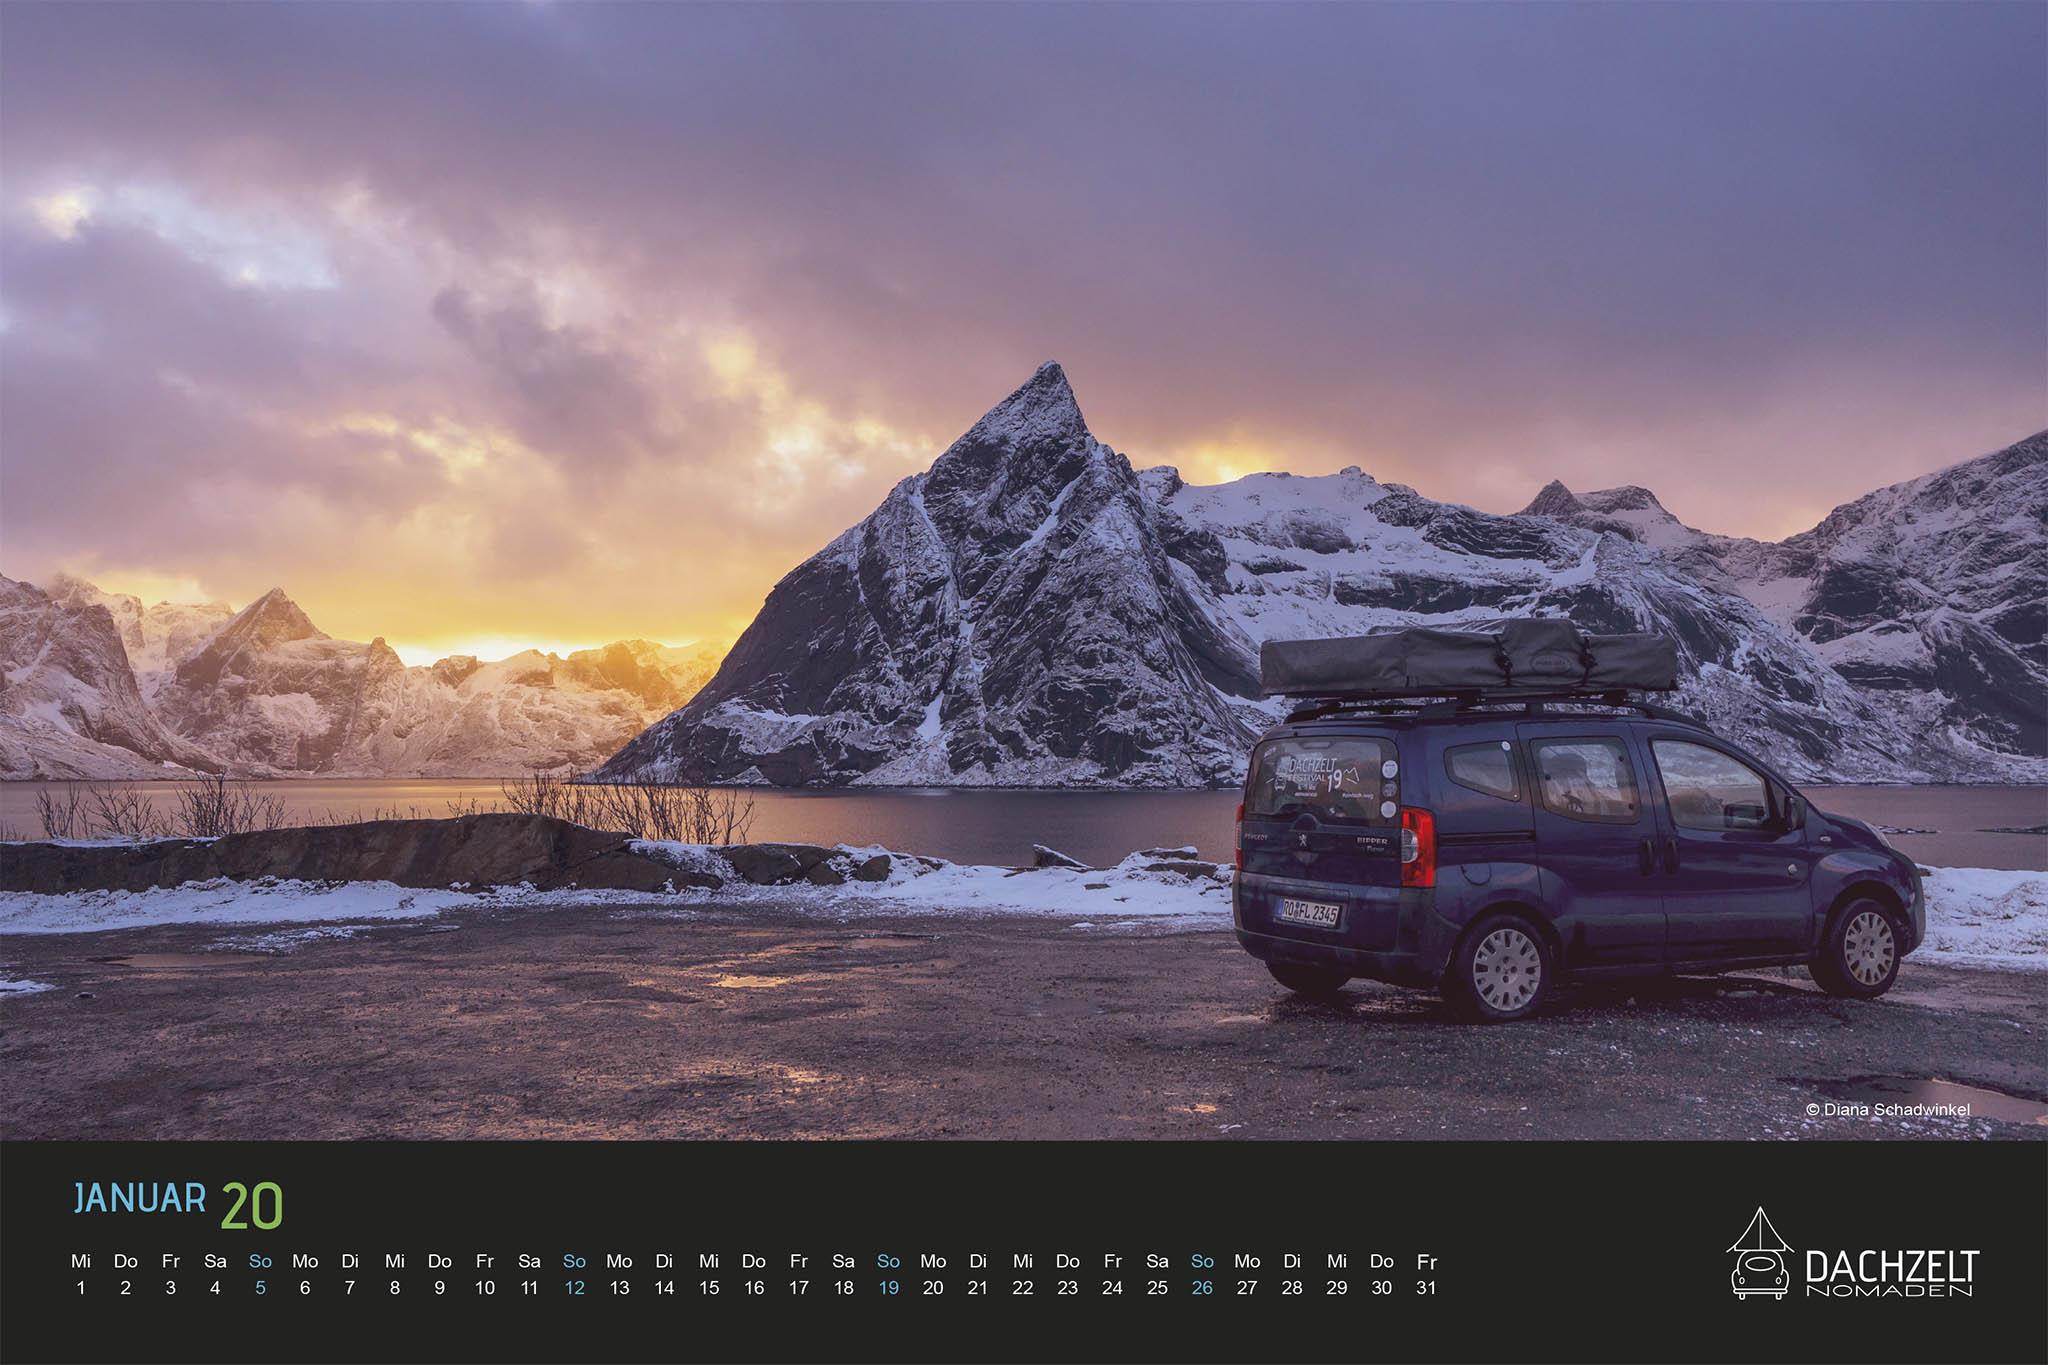 Dachzeltnomaden-Dachzelt-Kalender-2020-Januar.jpg